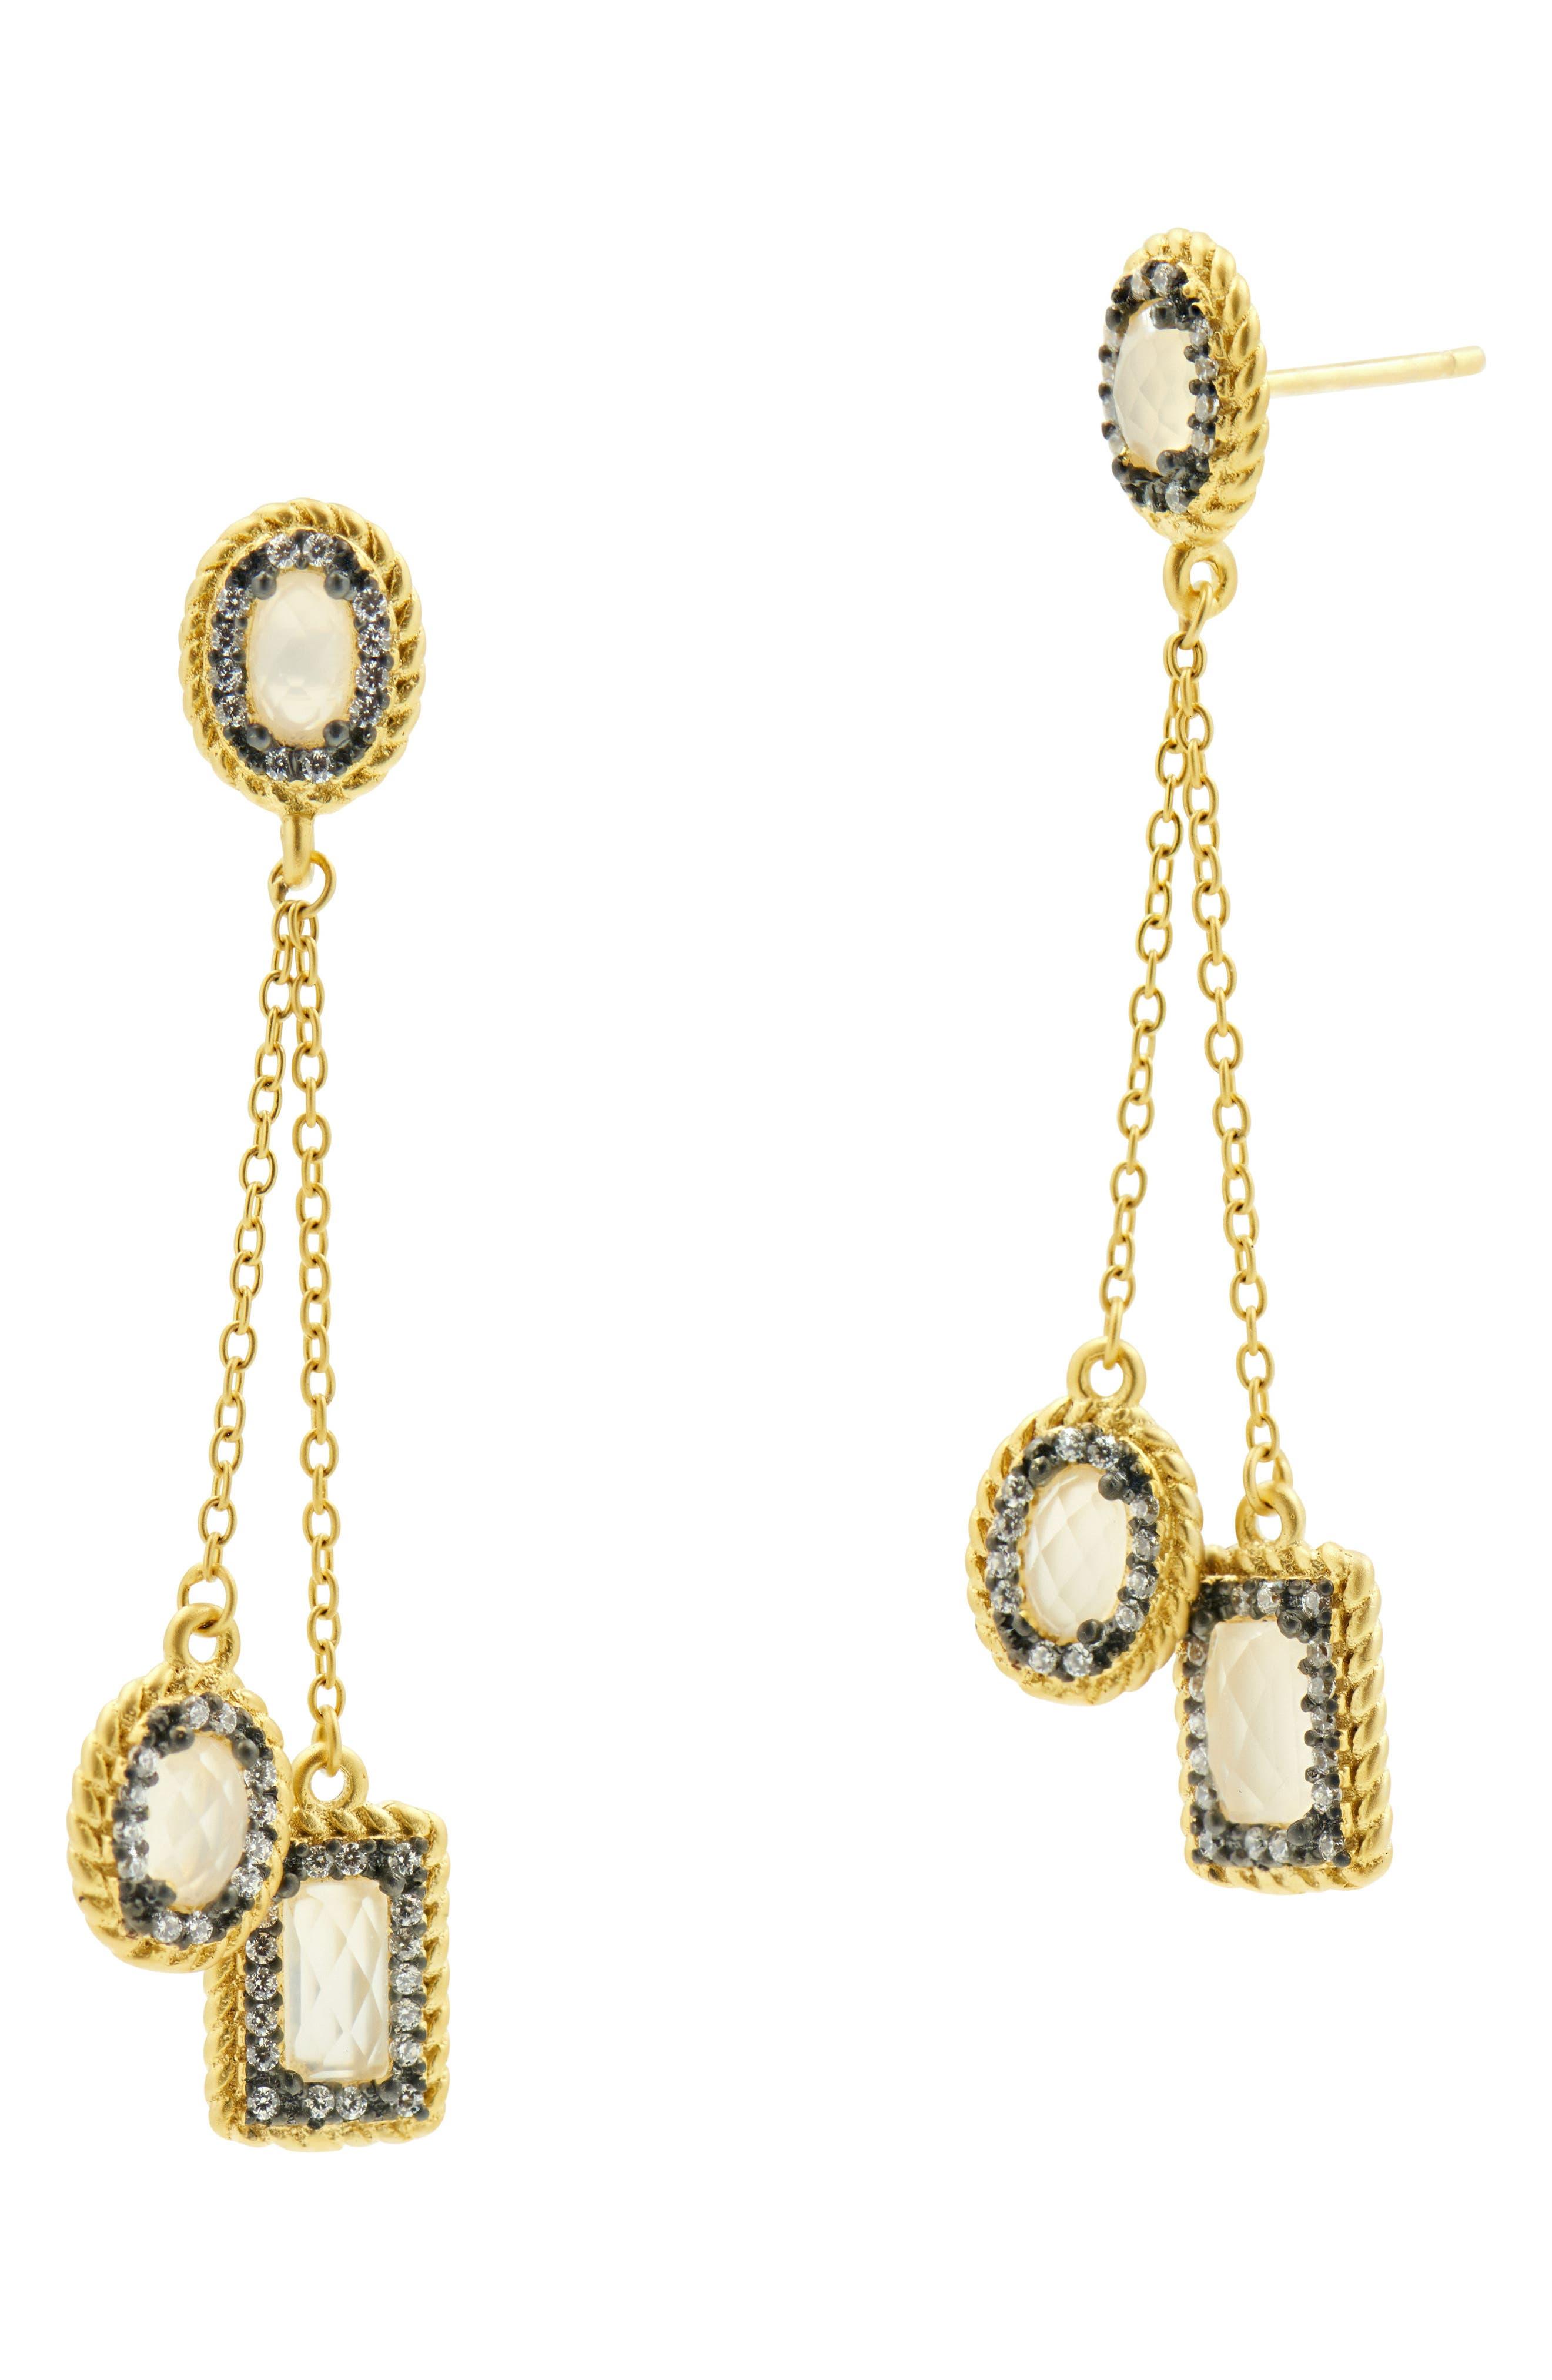 Chain Drop Earrings,                             Main thumbnail 1, color,                             710